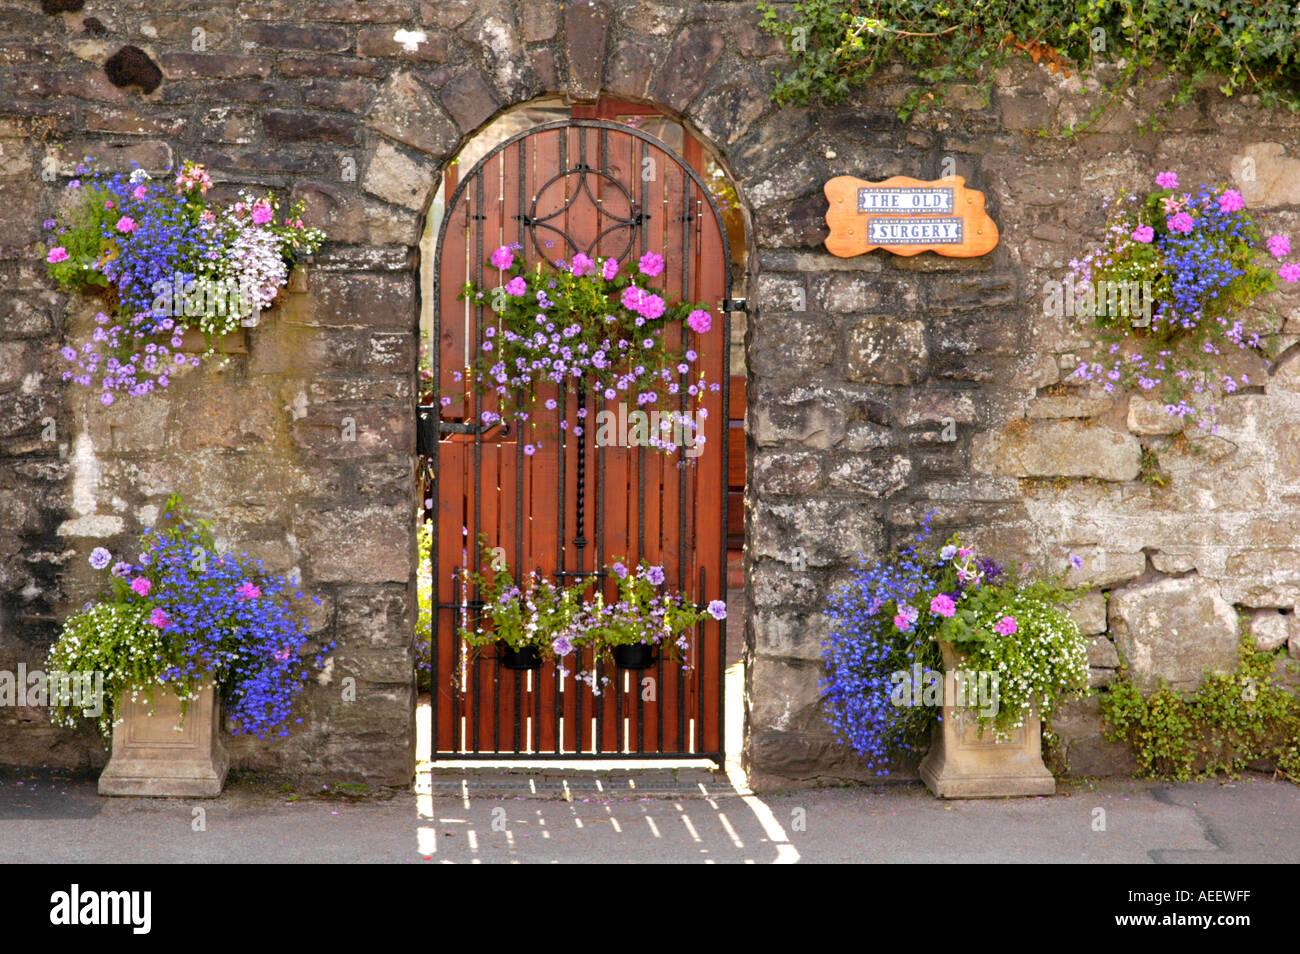 Garden Gate Floral – Home Image Ideas